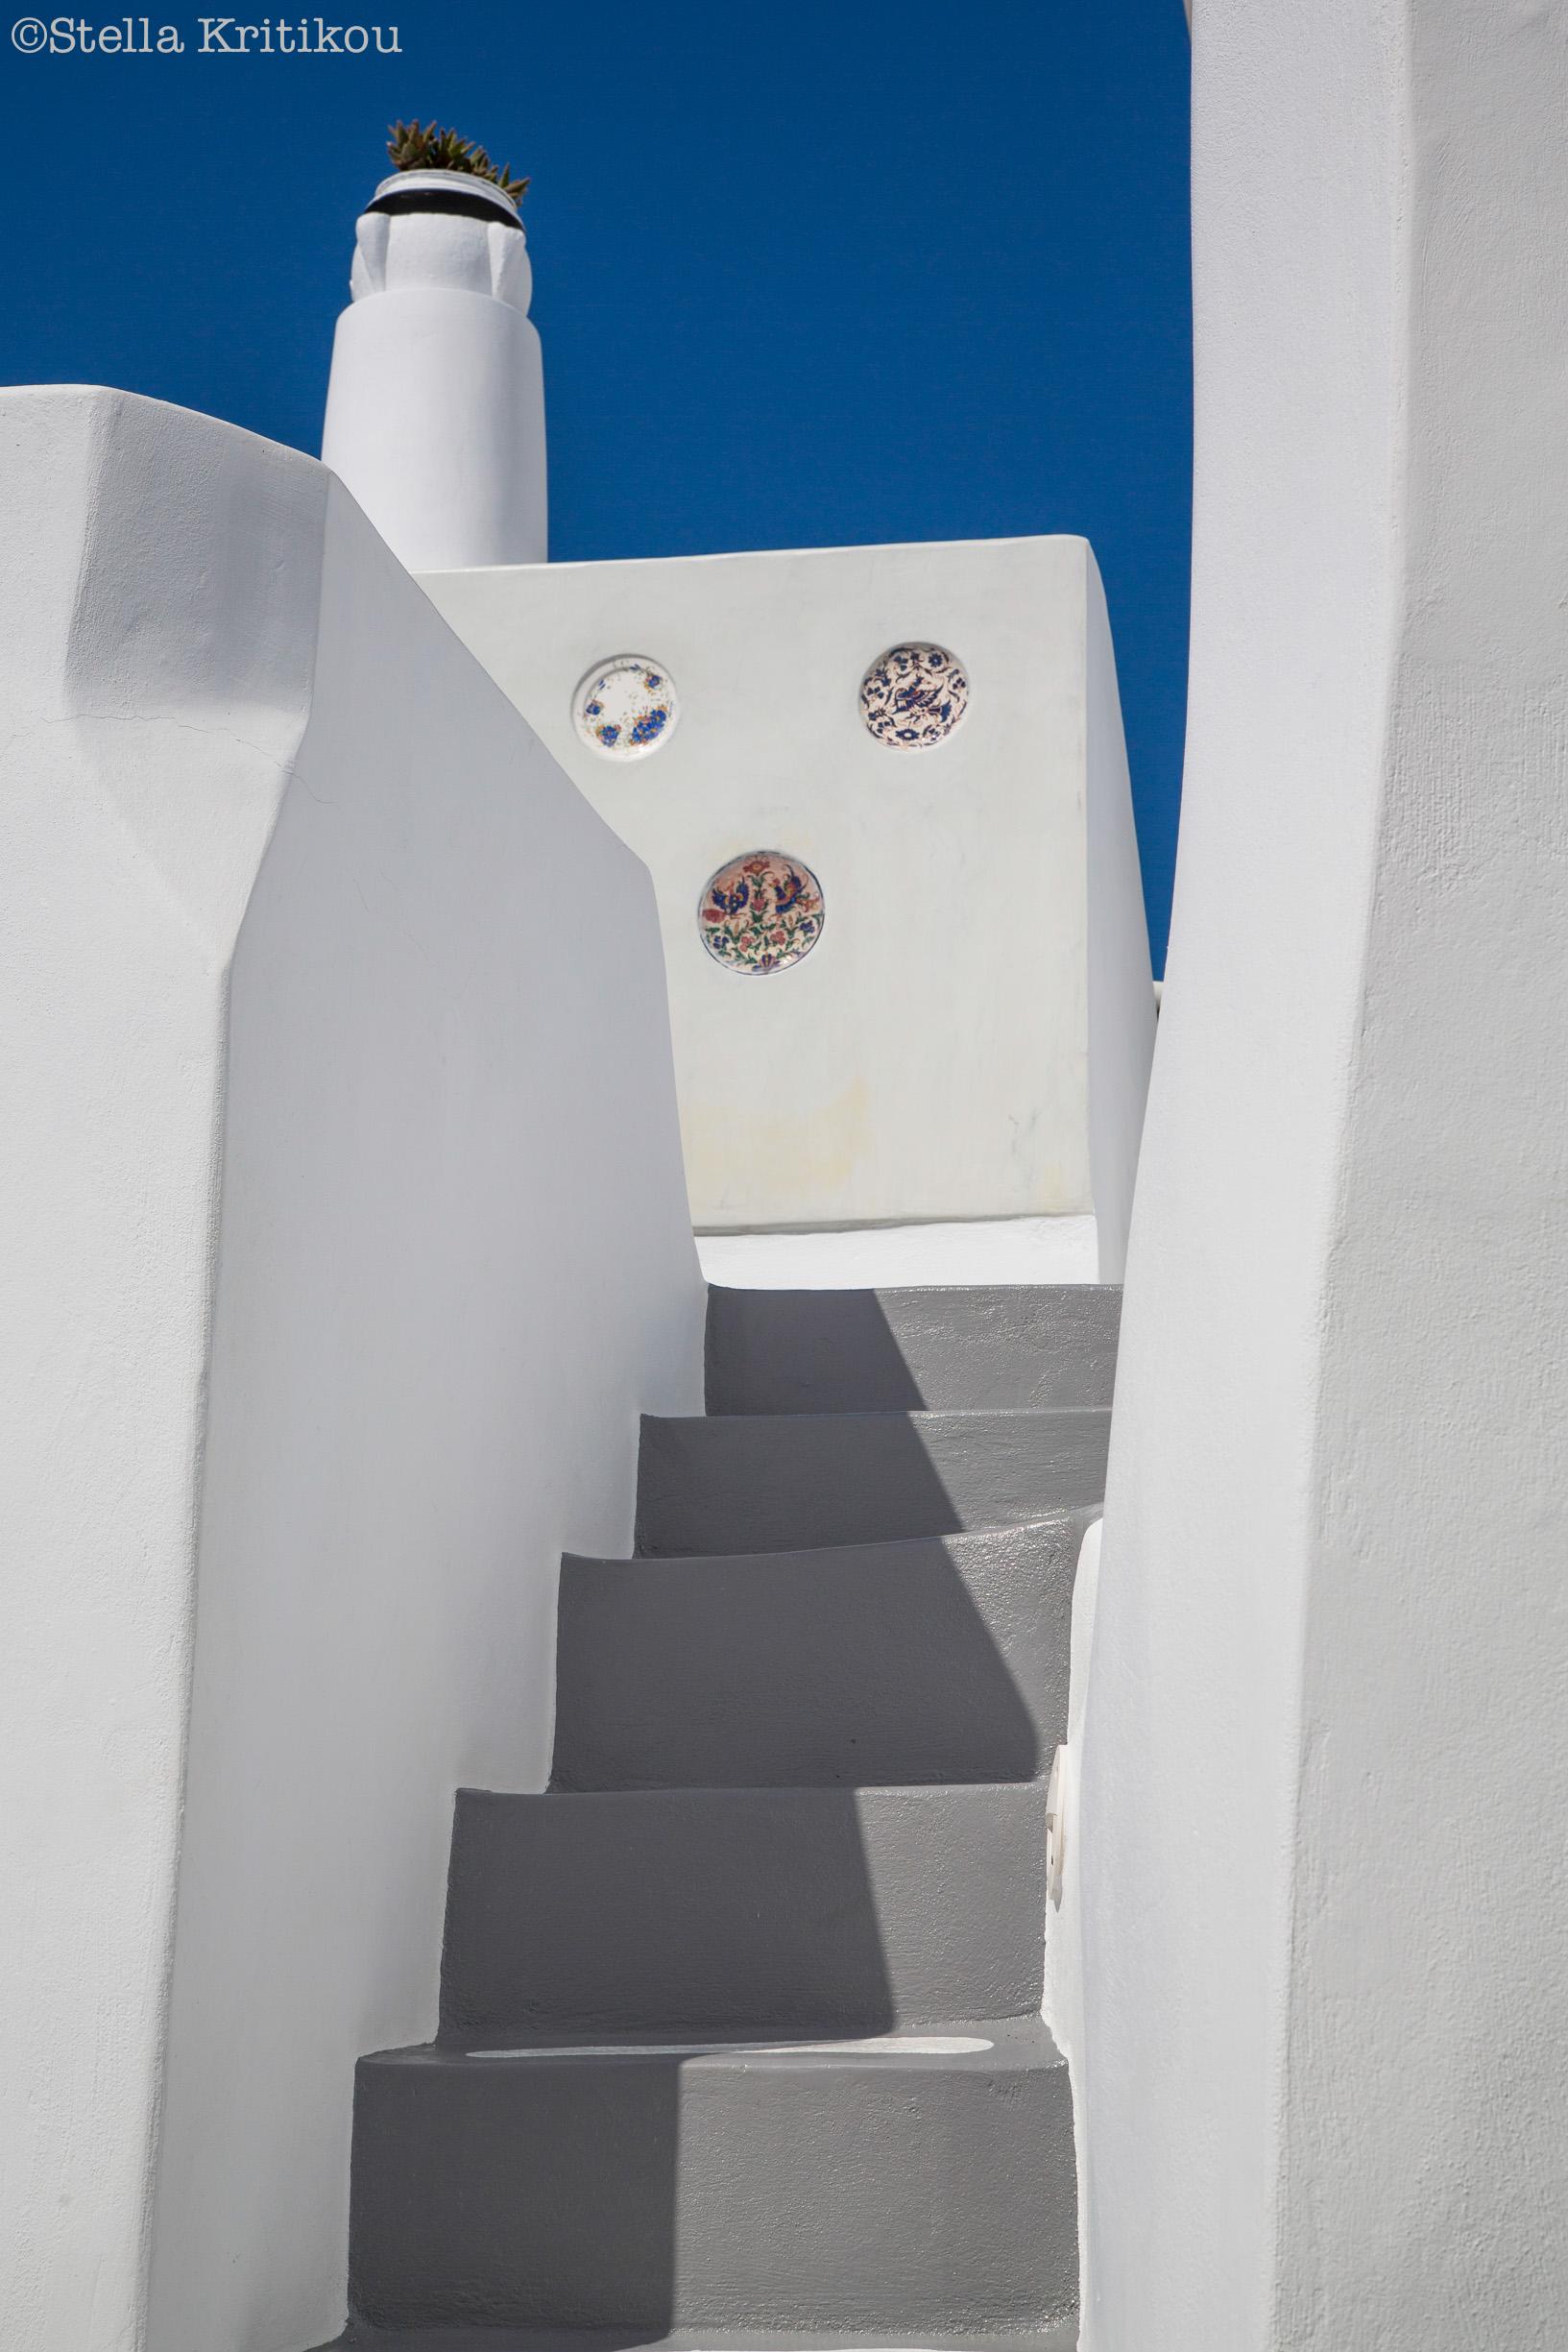 stella kritikou santorini stairway to heaven.jpg